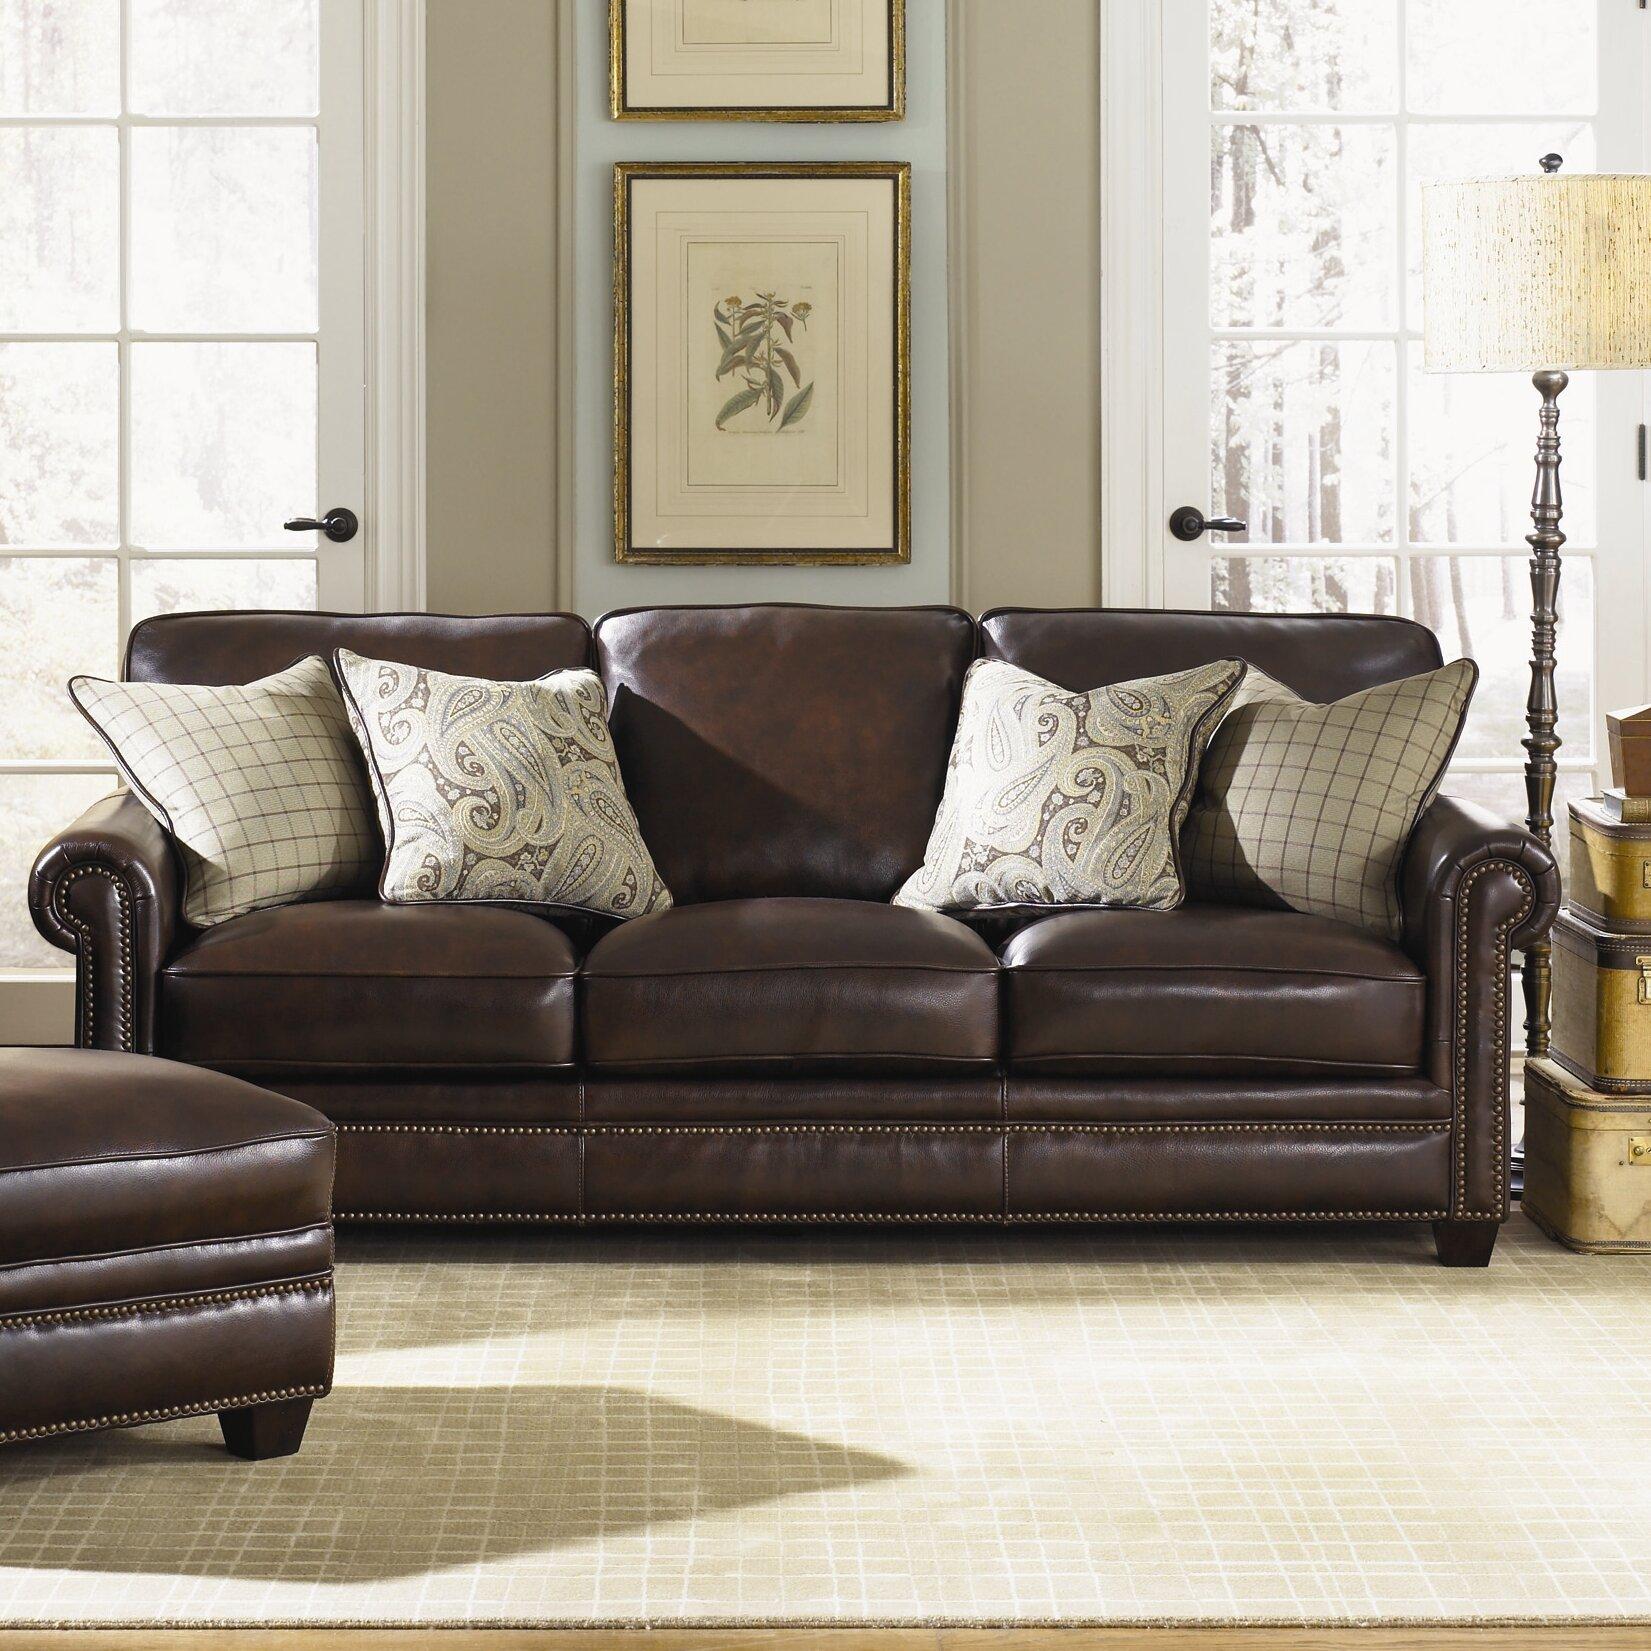 Reviews For Leather Sofas: Simon Li Burke Leather Sofa & Reviews